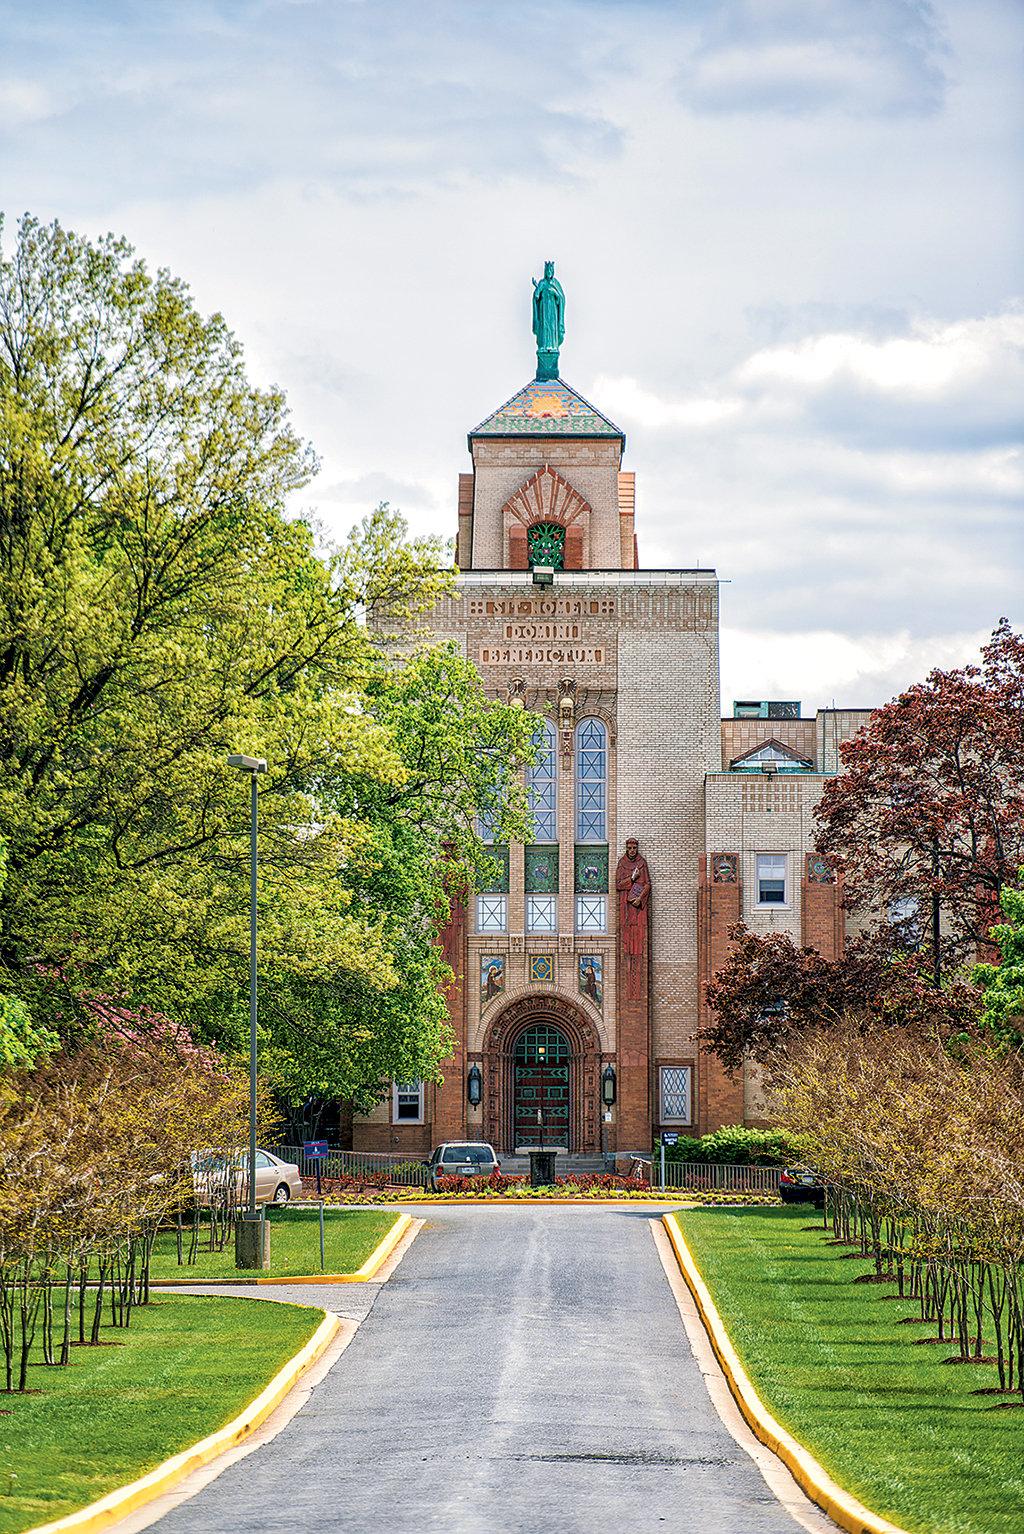 Photograph of Howard School of Divinity Courtesy of Howard U. Communications